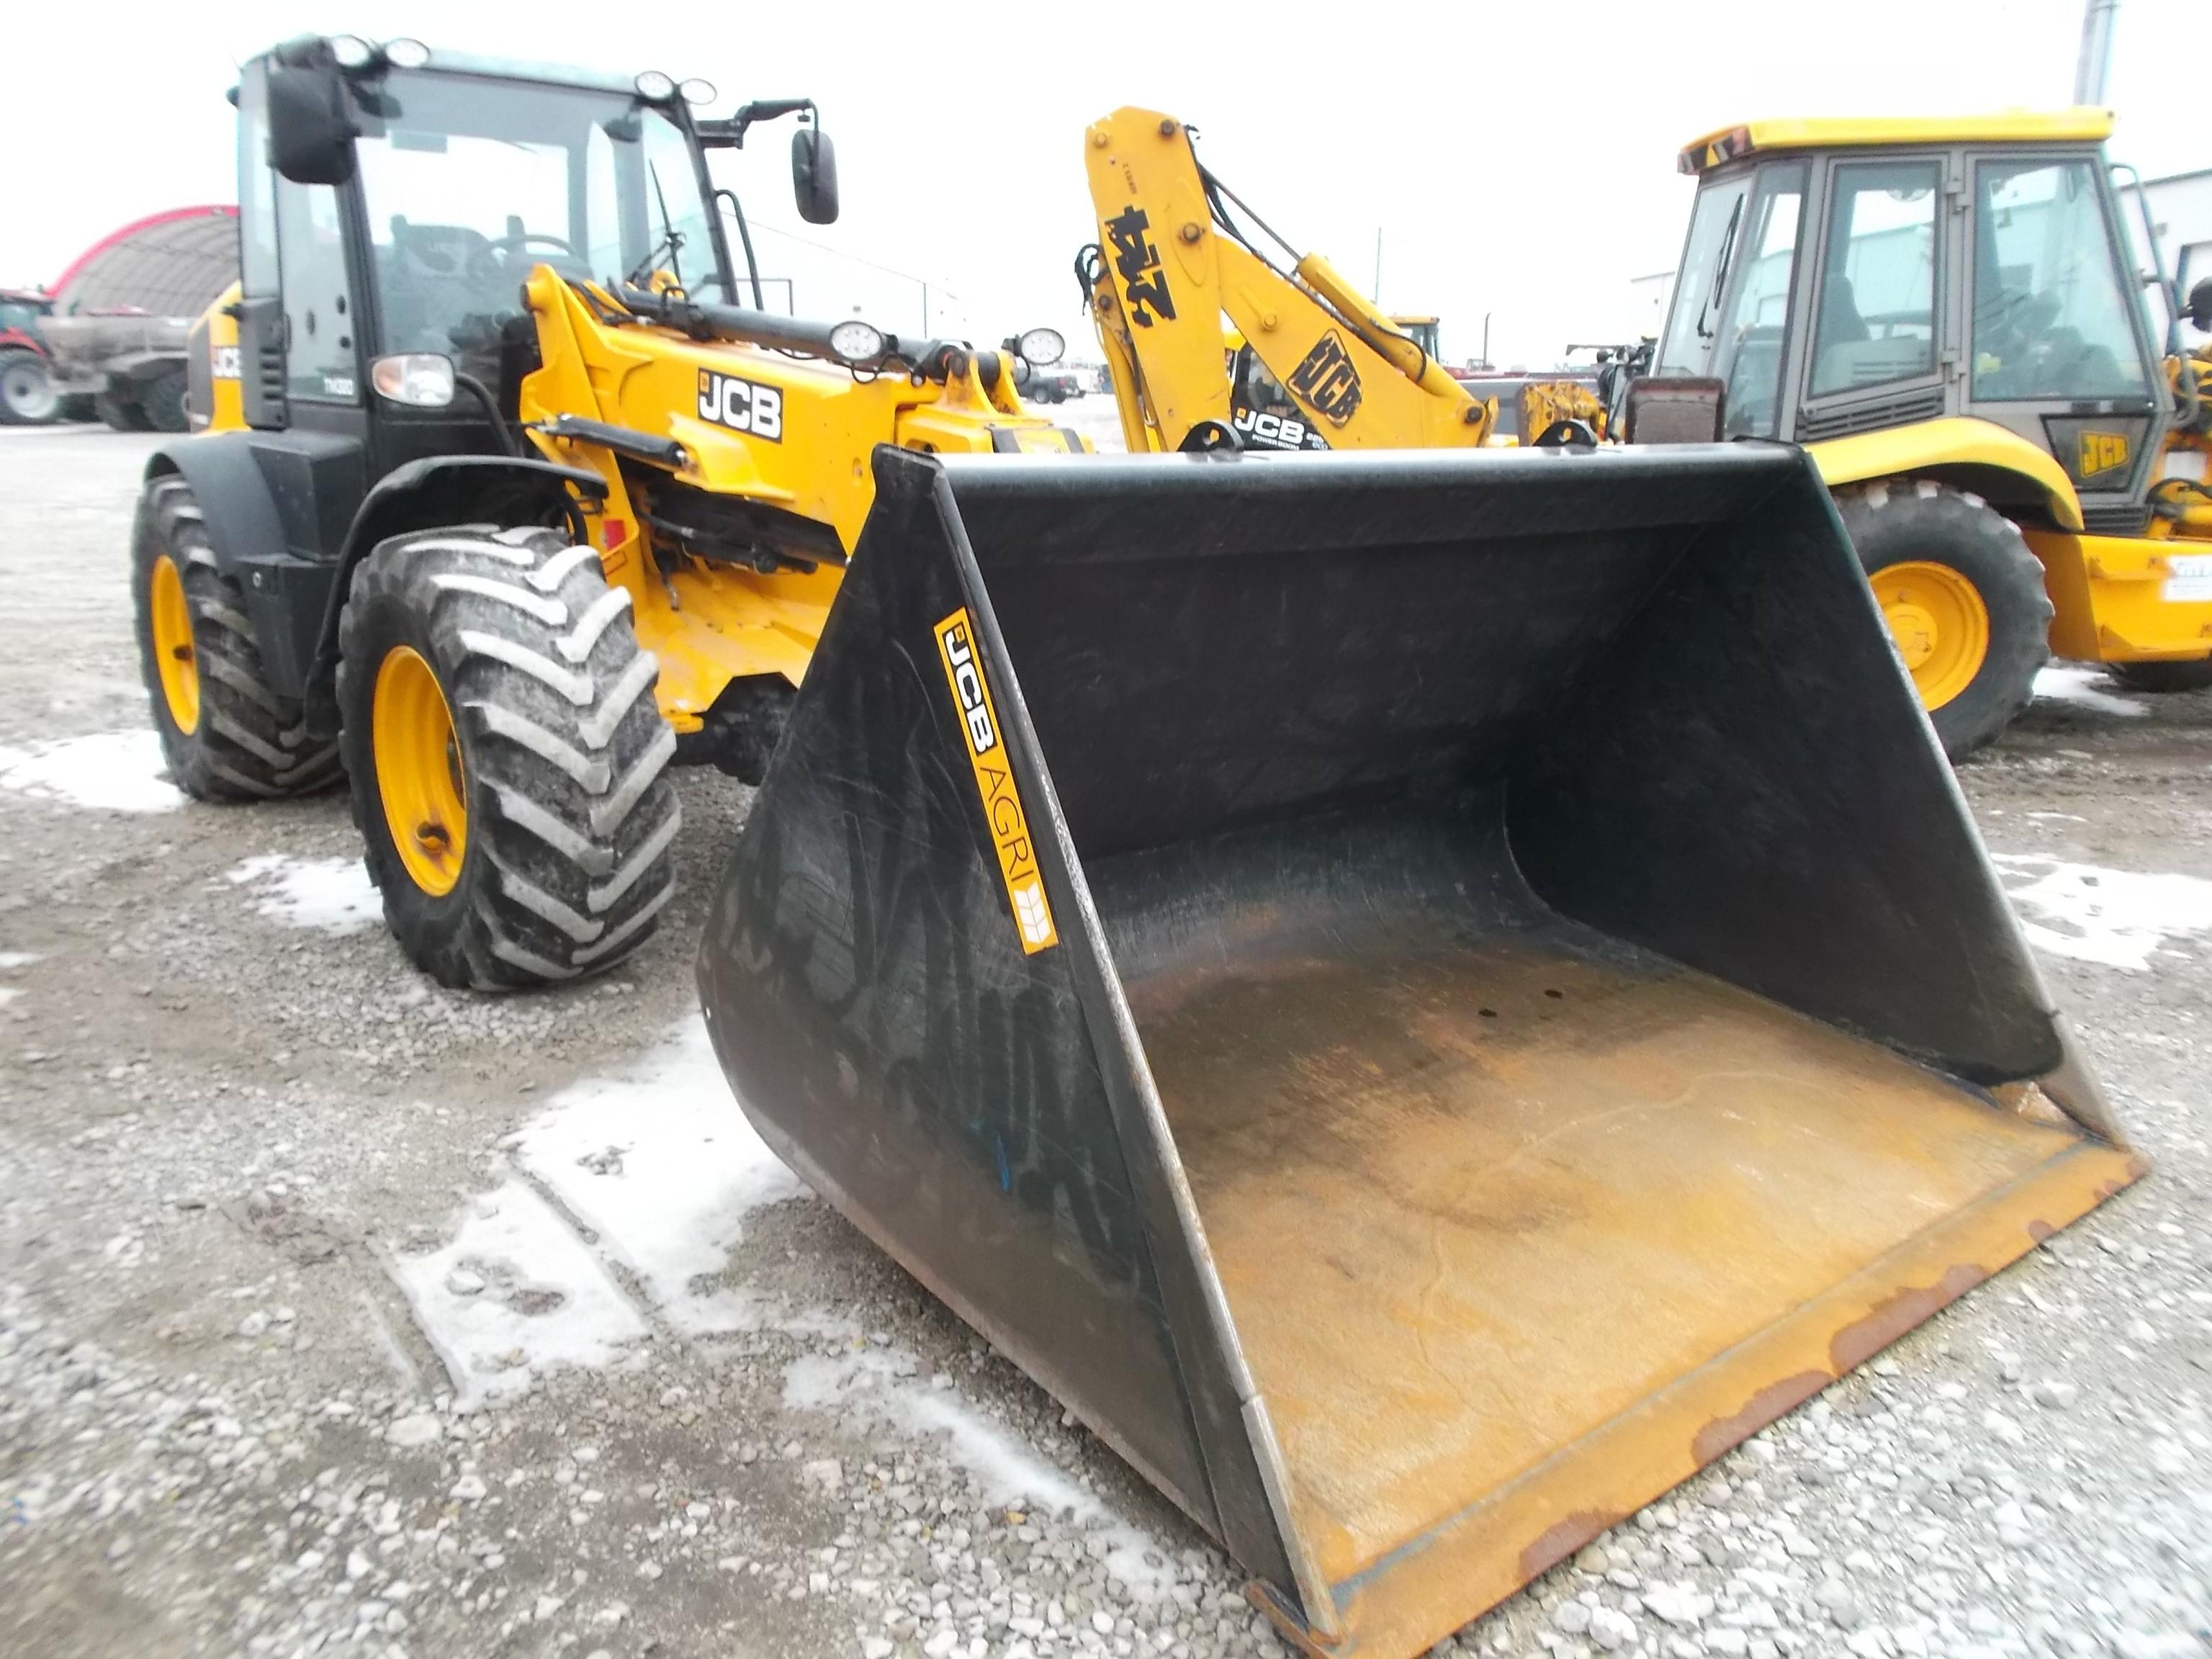 Used JCB Equipment For Sale In Missouri & Illinois